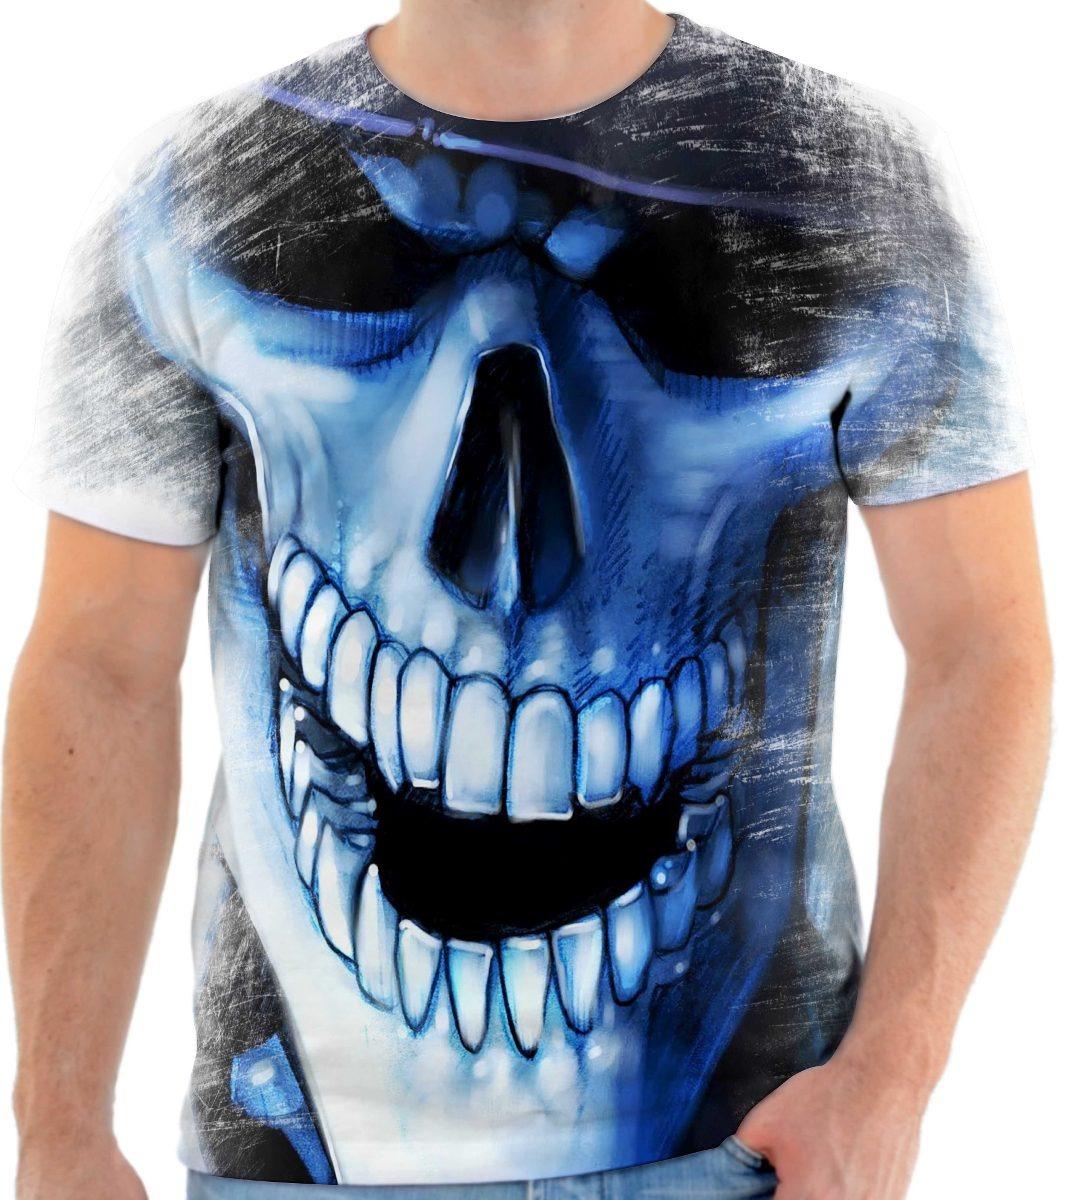 camisa camiseta personalizada caveira chapéu malandra. Carregando zoom. edf707f3755